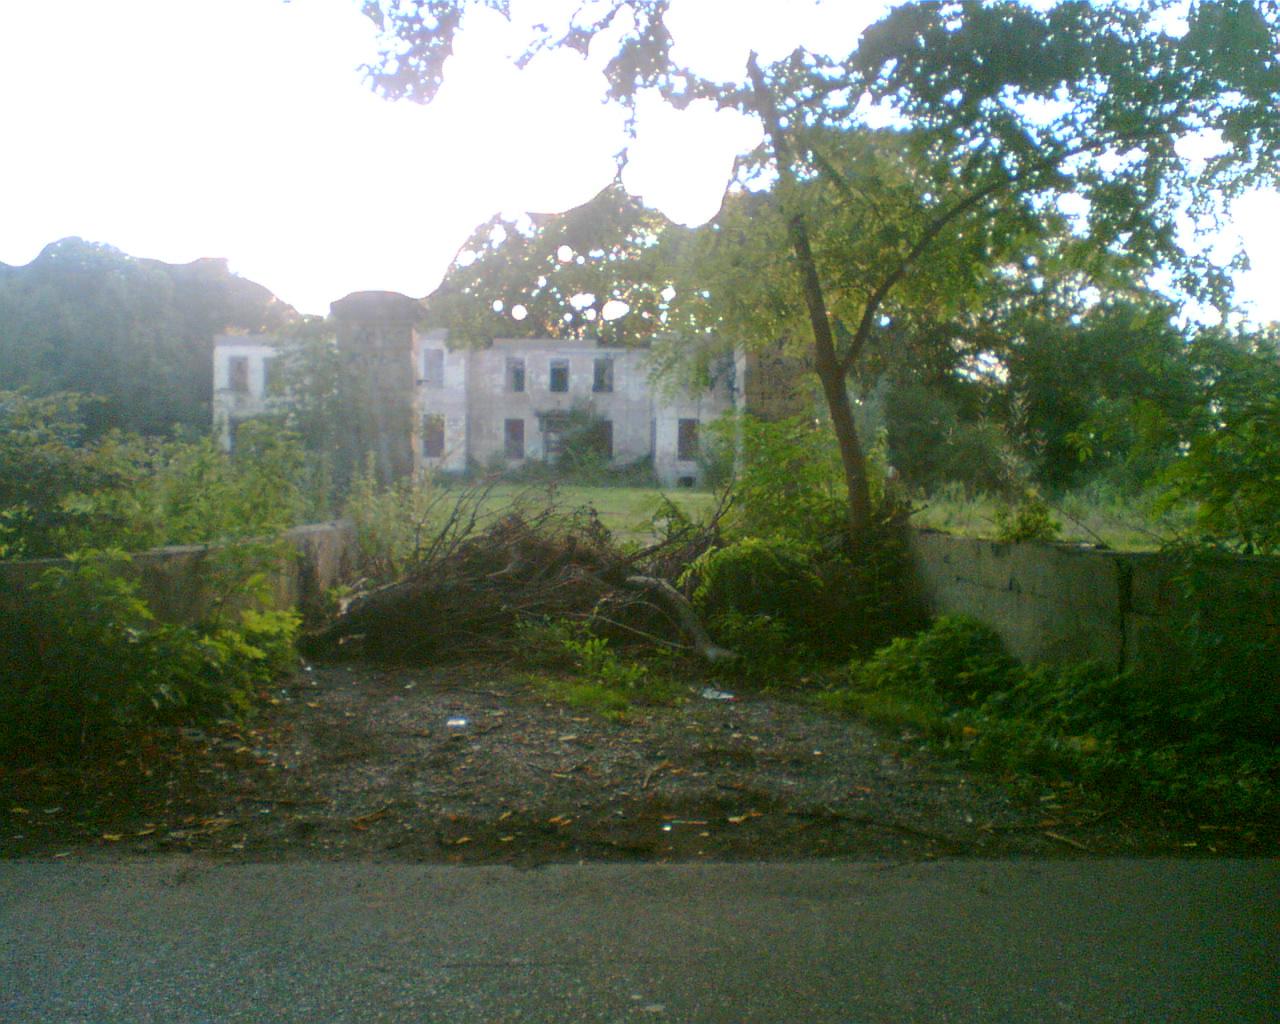 Das Geisterhaus in Budberg (nähe Duisburg) (Seite 149